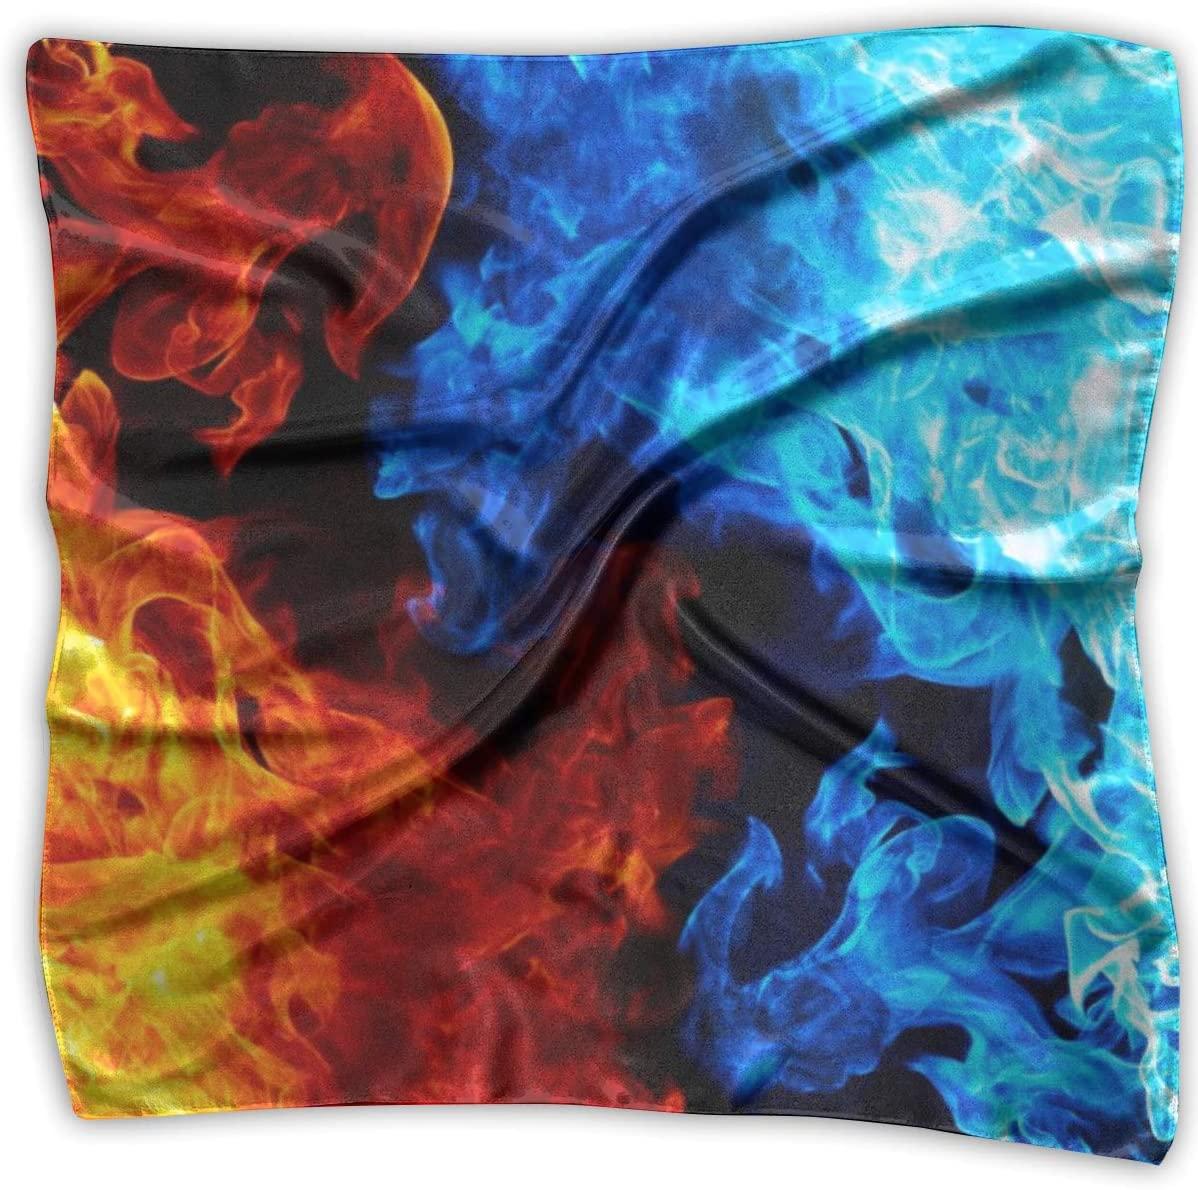 WFIRE Blue and Red Flames Square Handkerchiefs Scarf Shawl Bandanas Headscarf Neckerchief